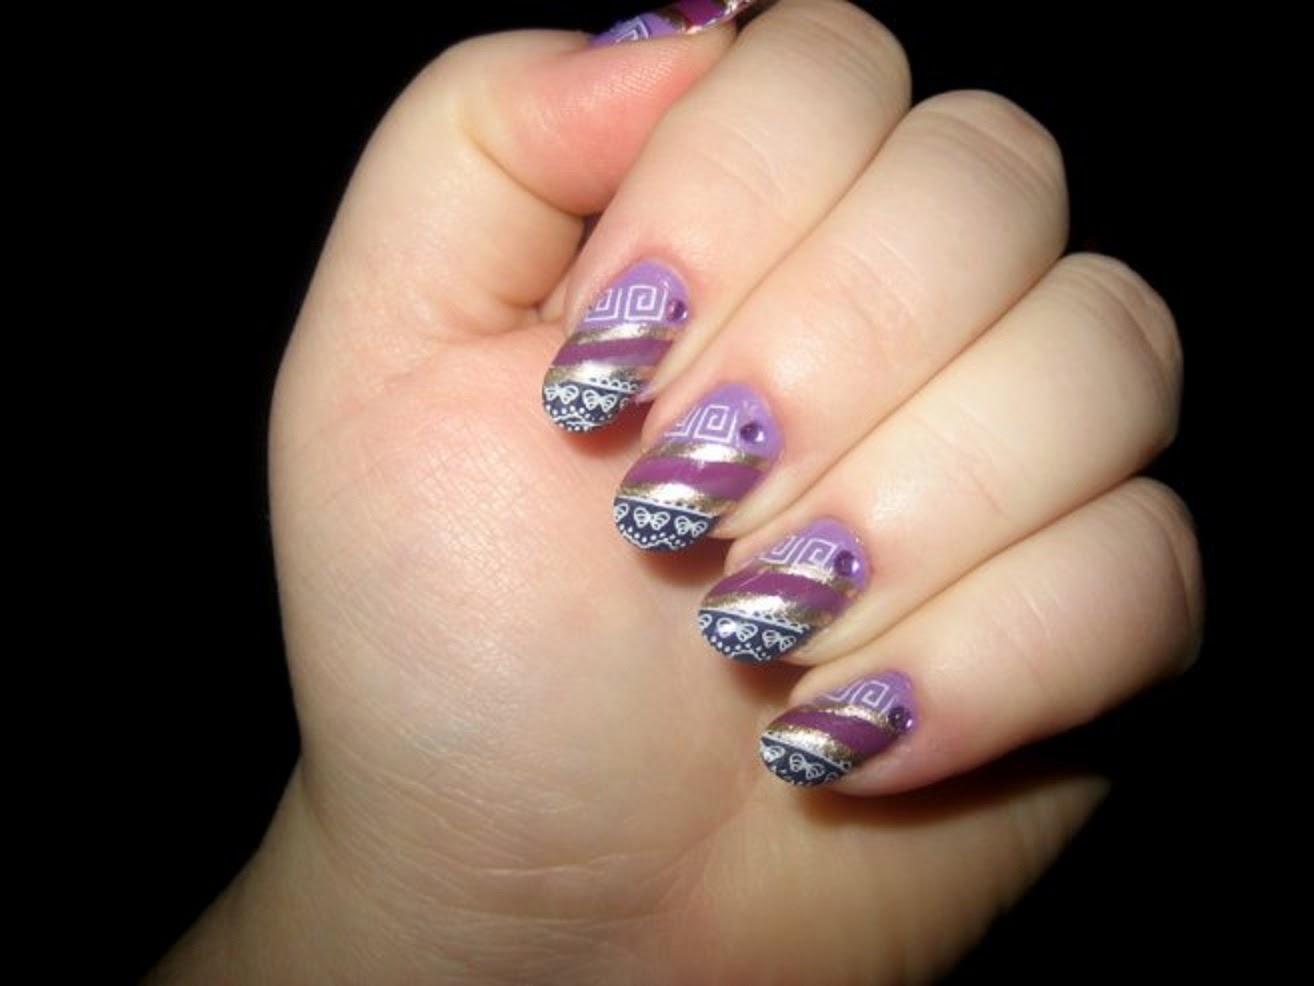 Beautiful Nail Art and Design